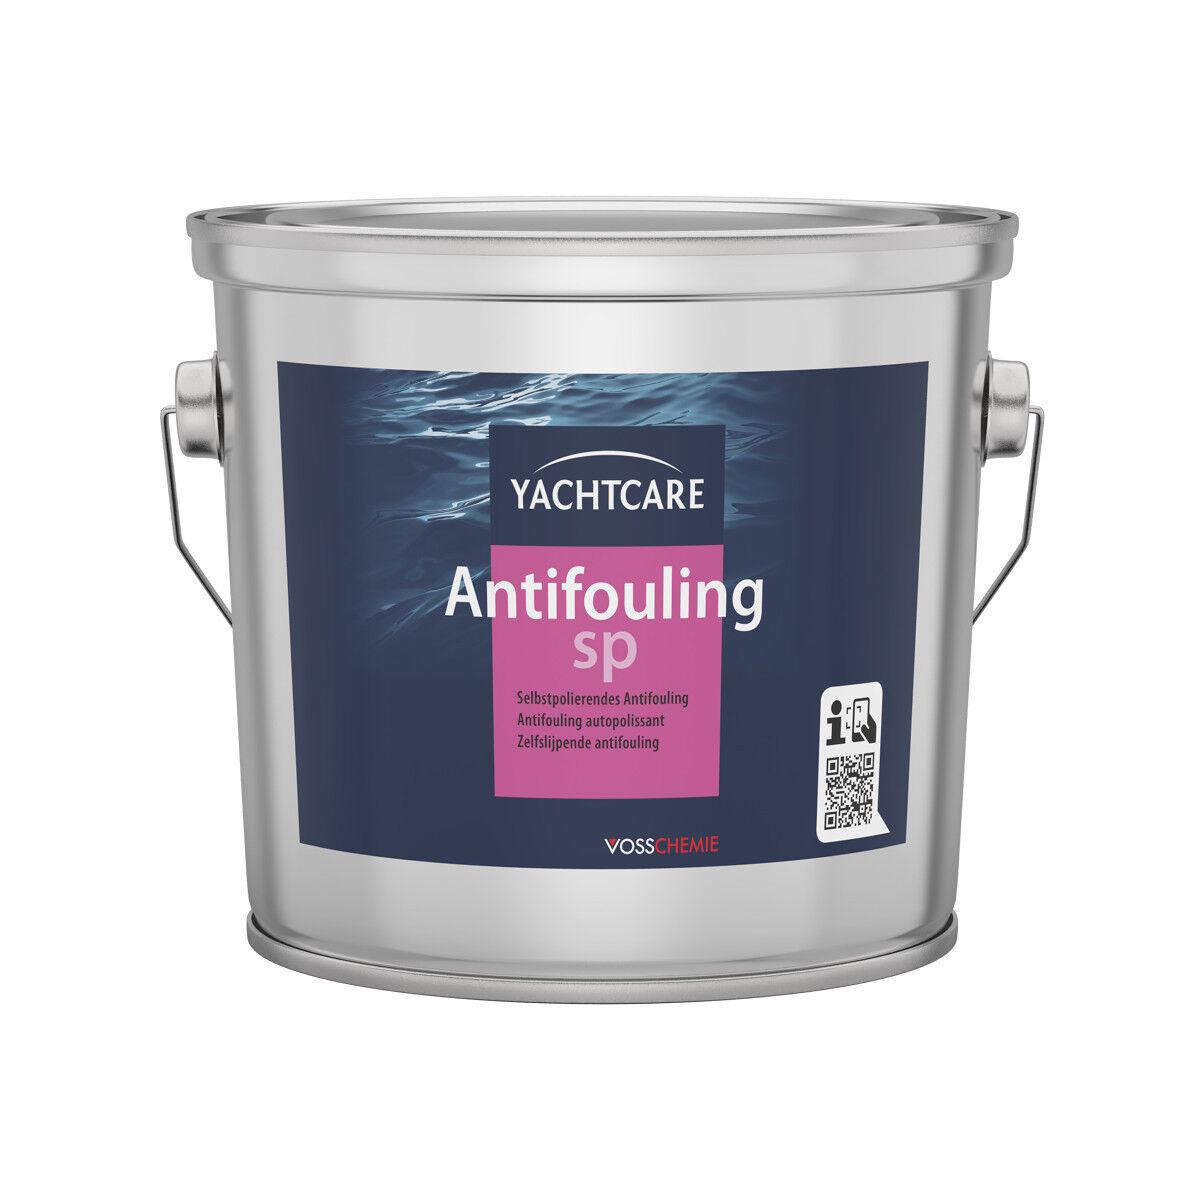 Yachtcare Antifouling SP SP SP selbstpolierendes Antifouling // 2,5l schwarz 3a2cdd